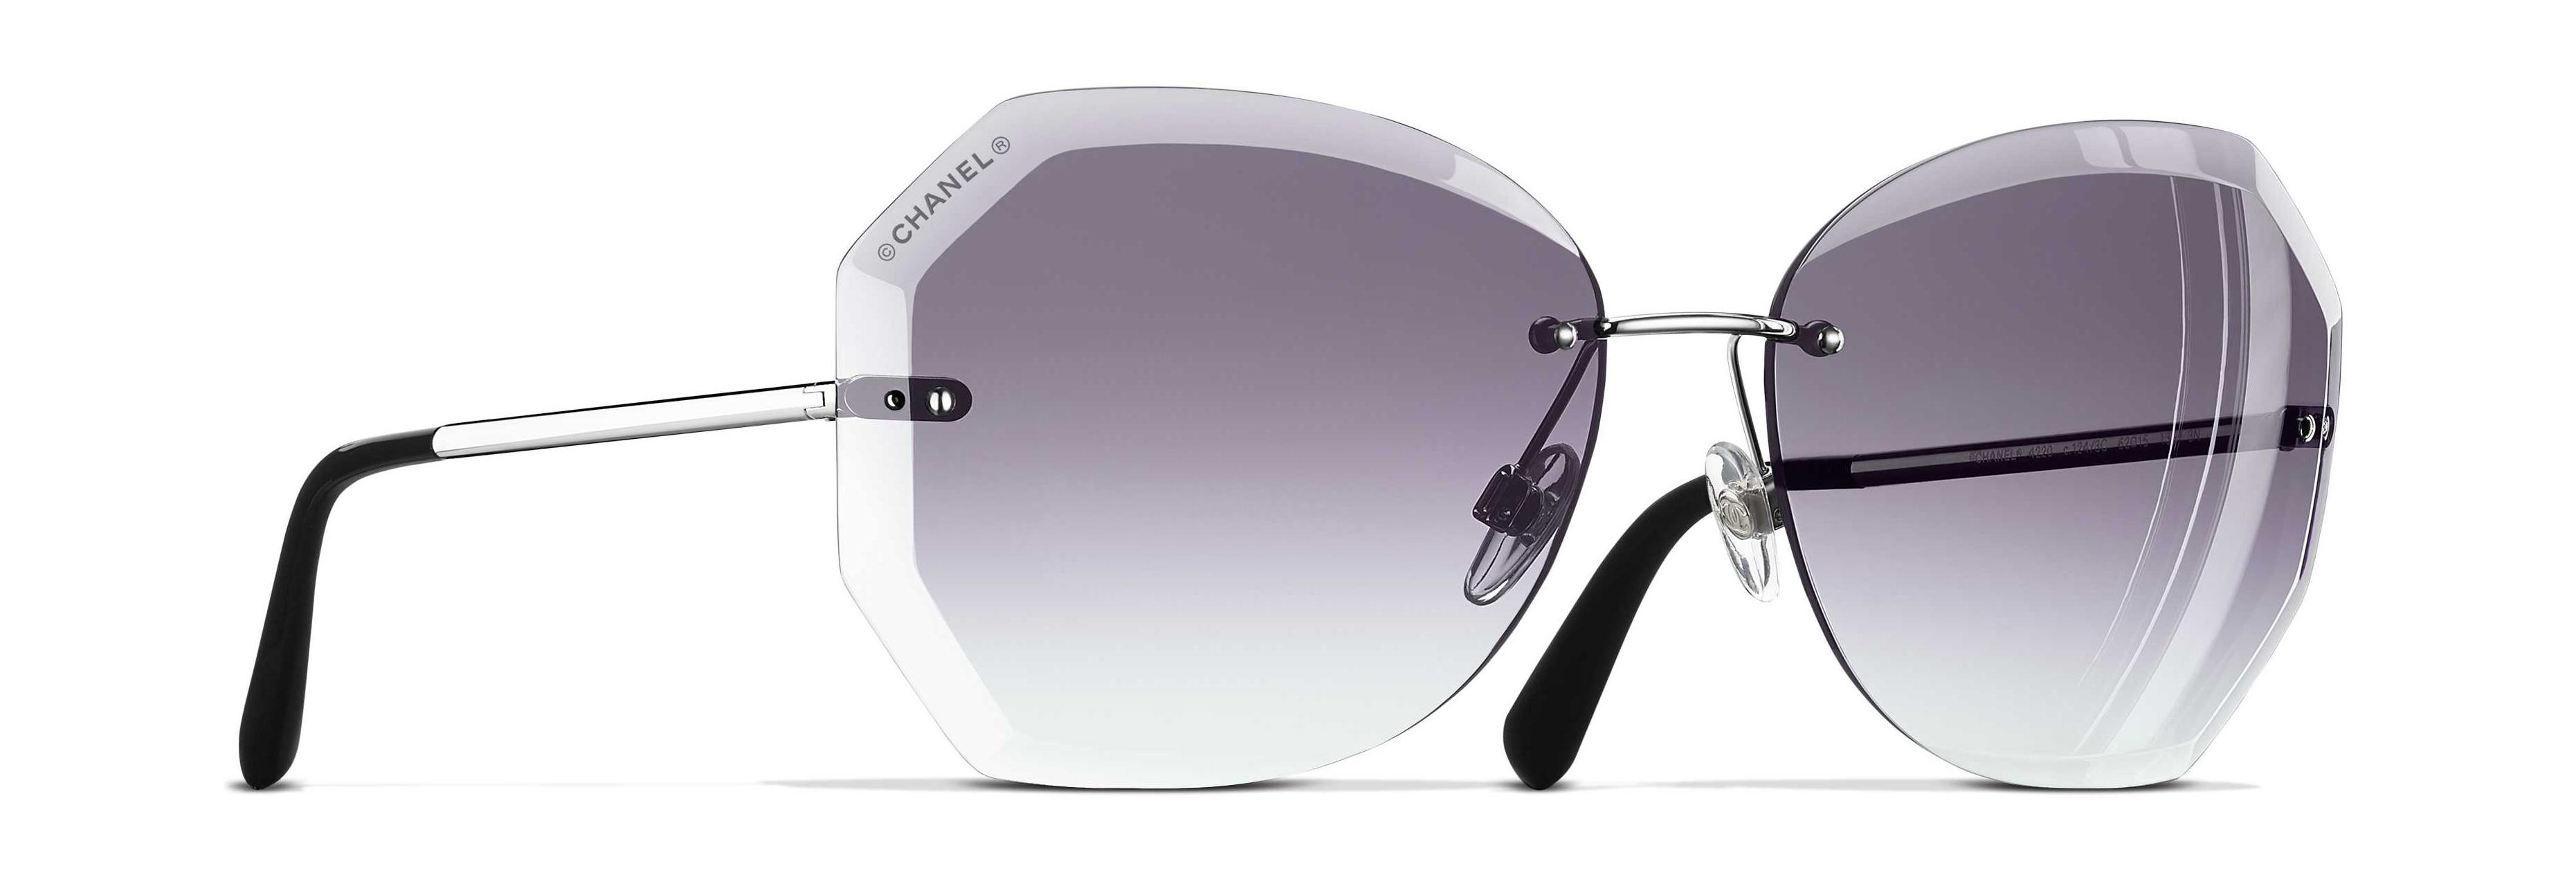 Sunglasses Women CHANEL CH 4220 C1243C 62/15